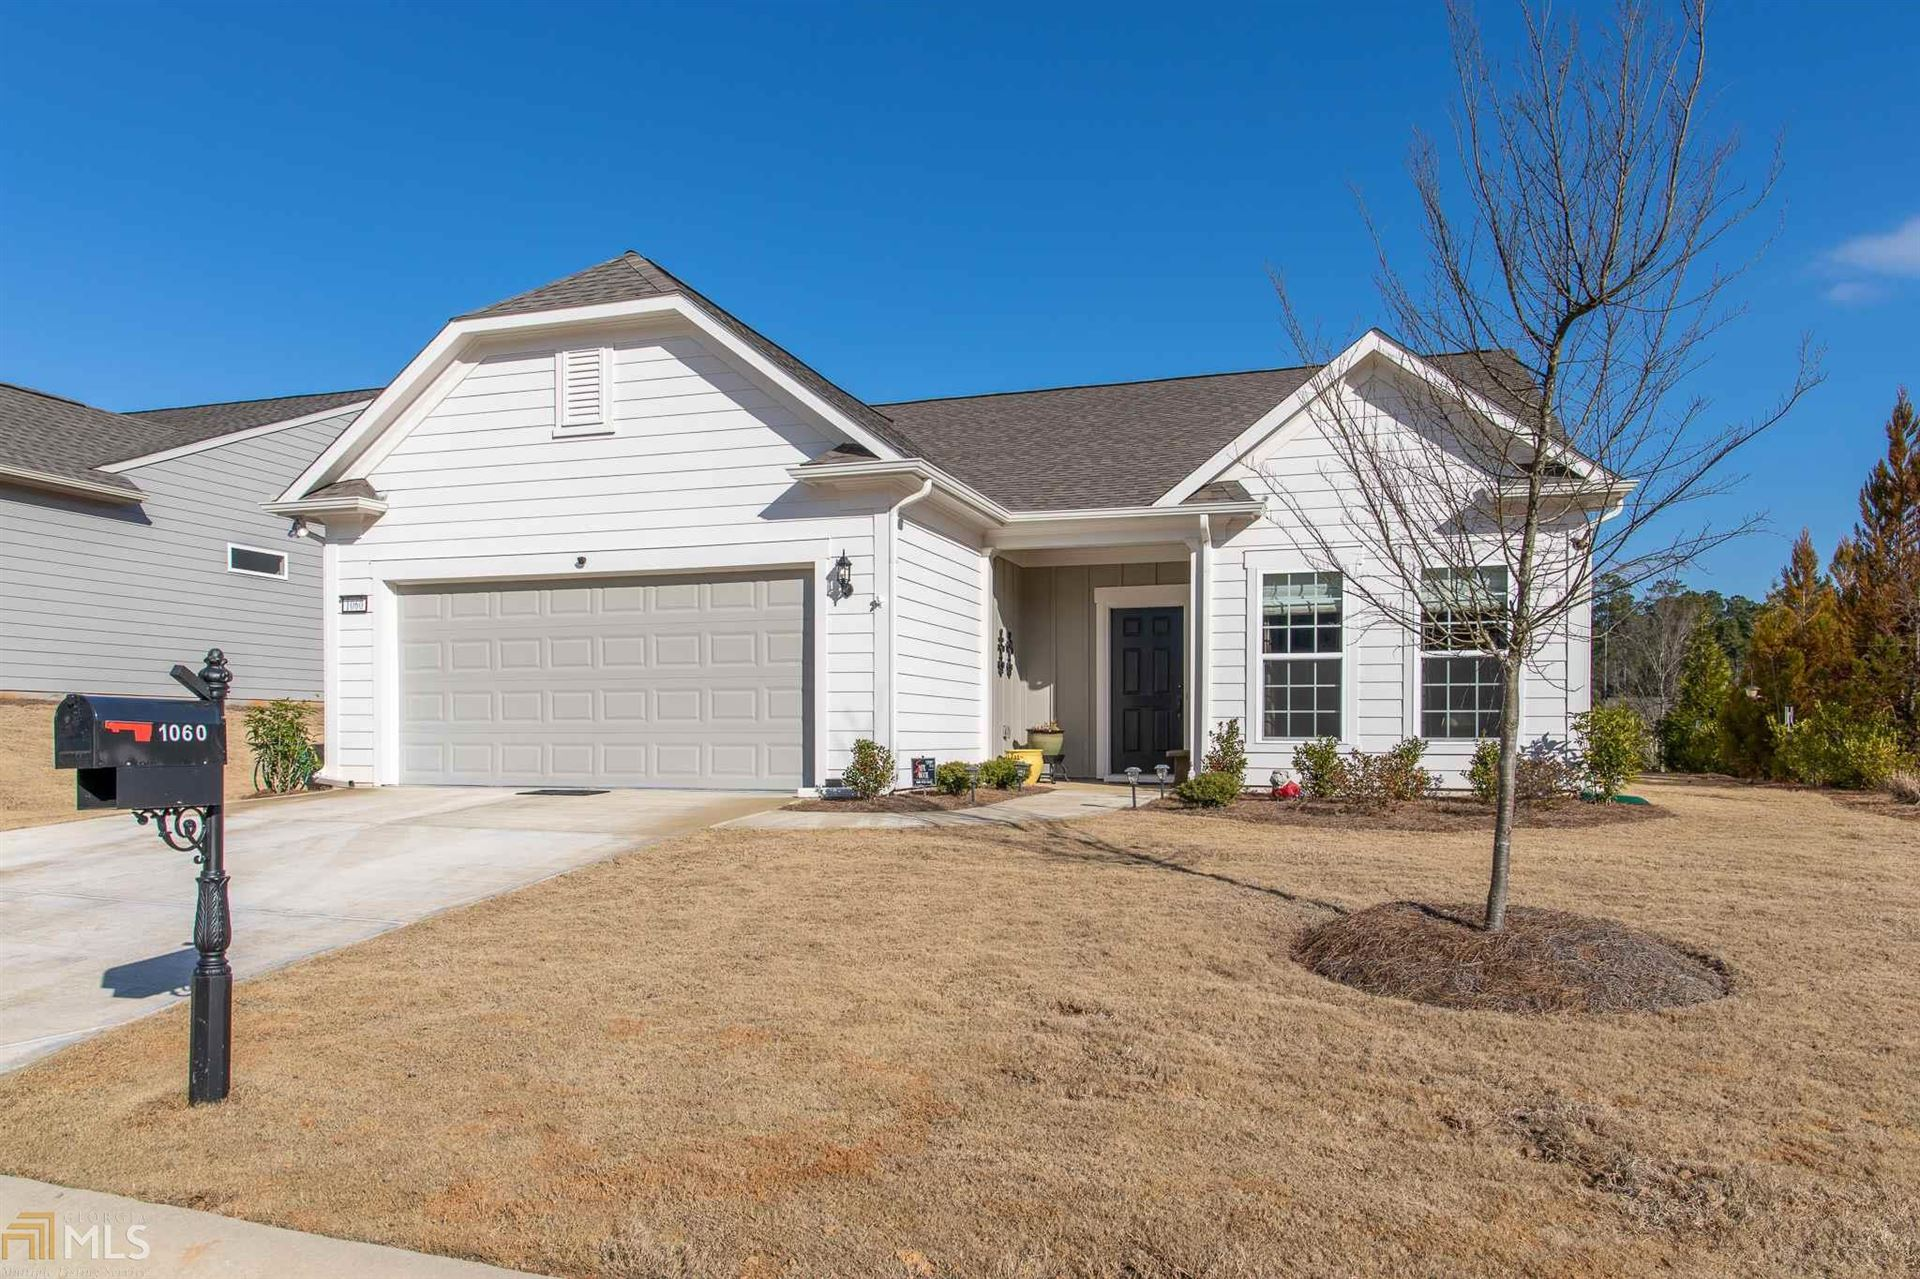 1060 Lone Oak Rd, Greensboro, GA 30642 - MLS#: 8929228